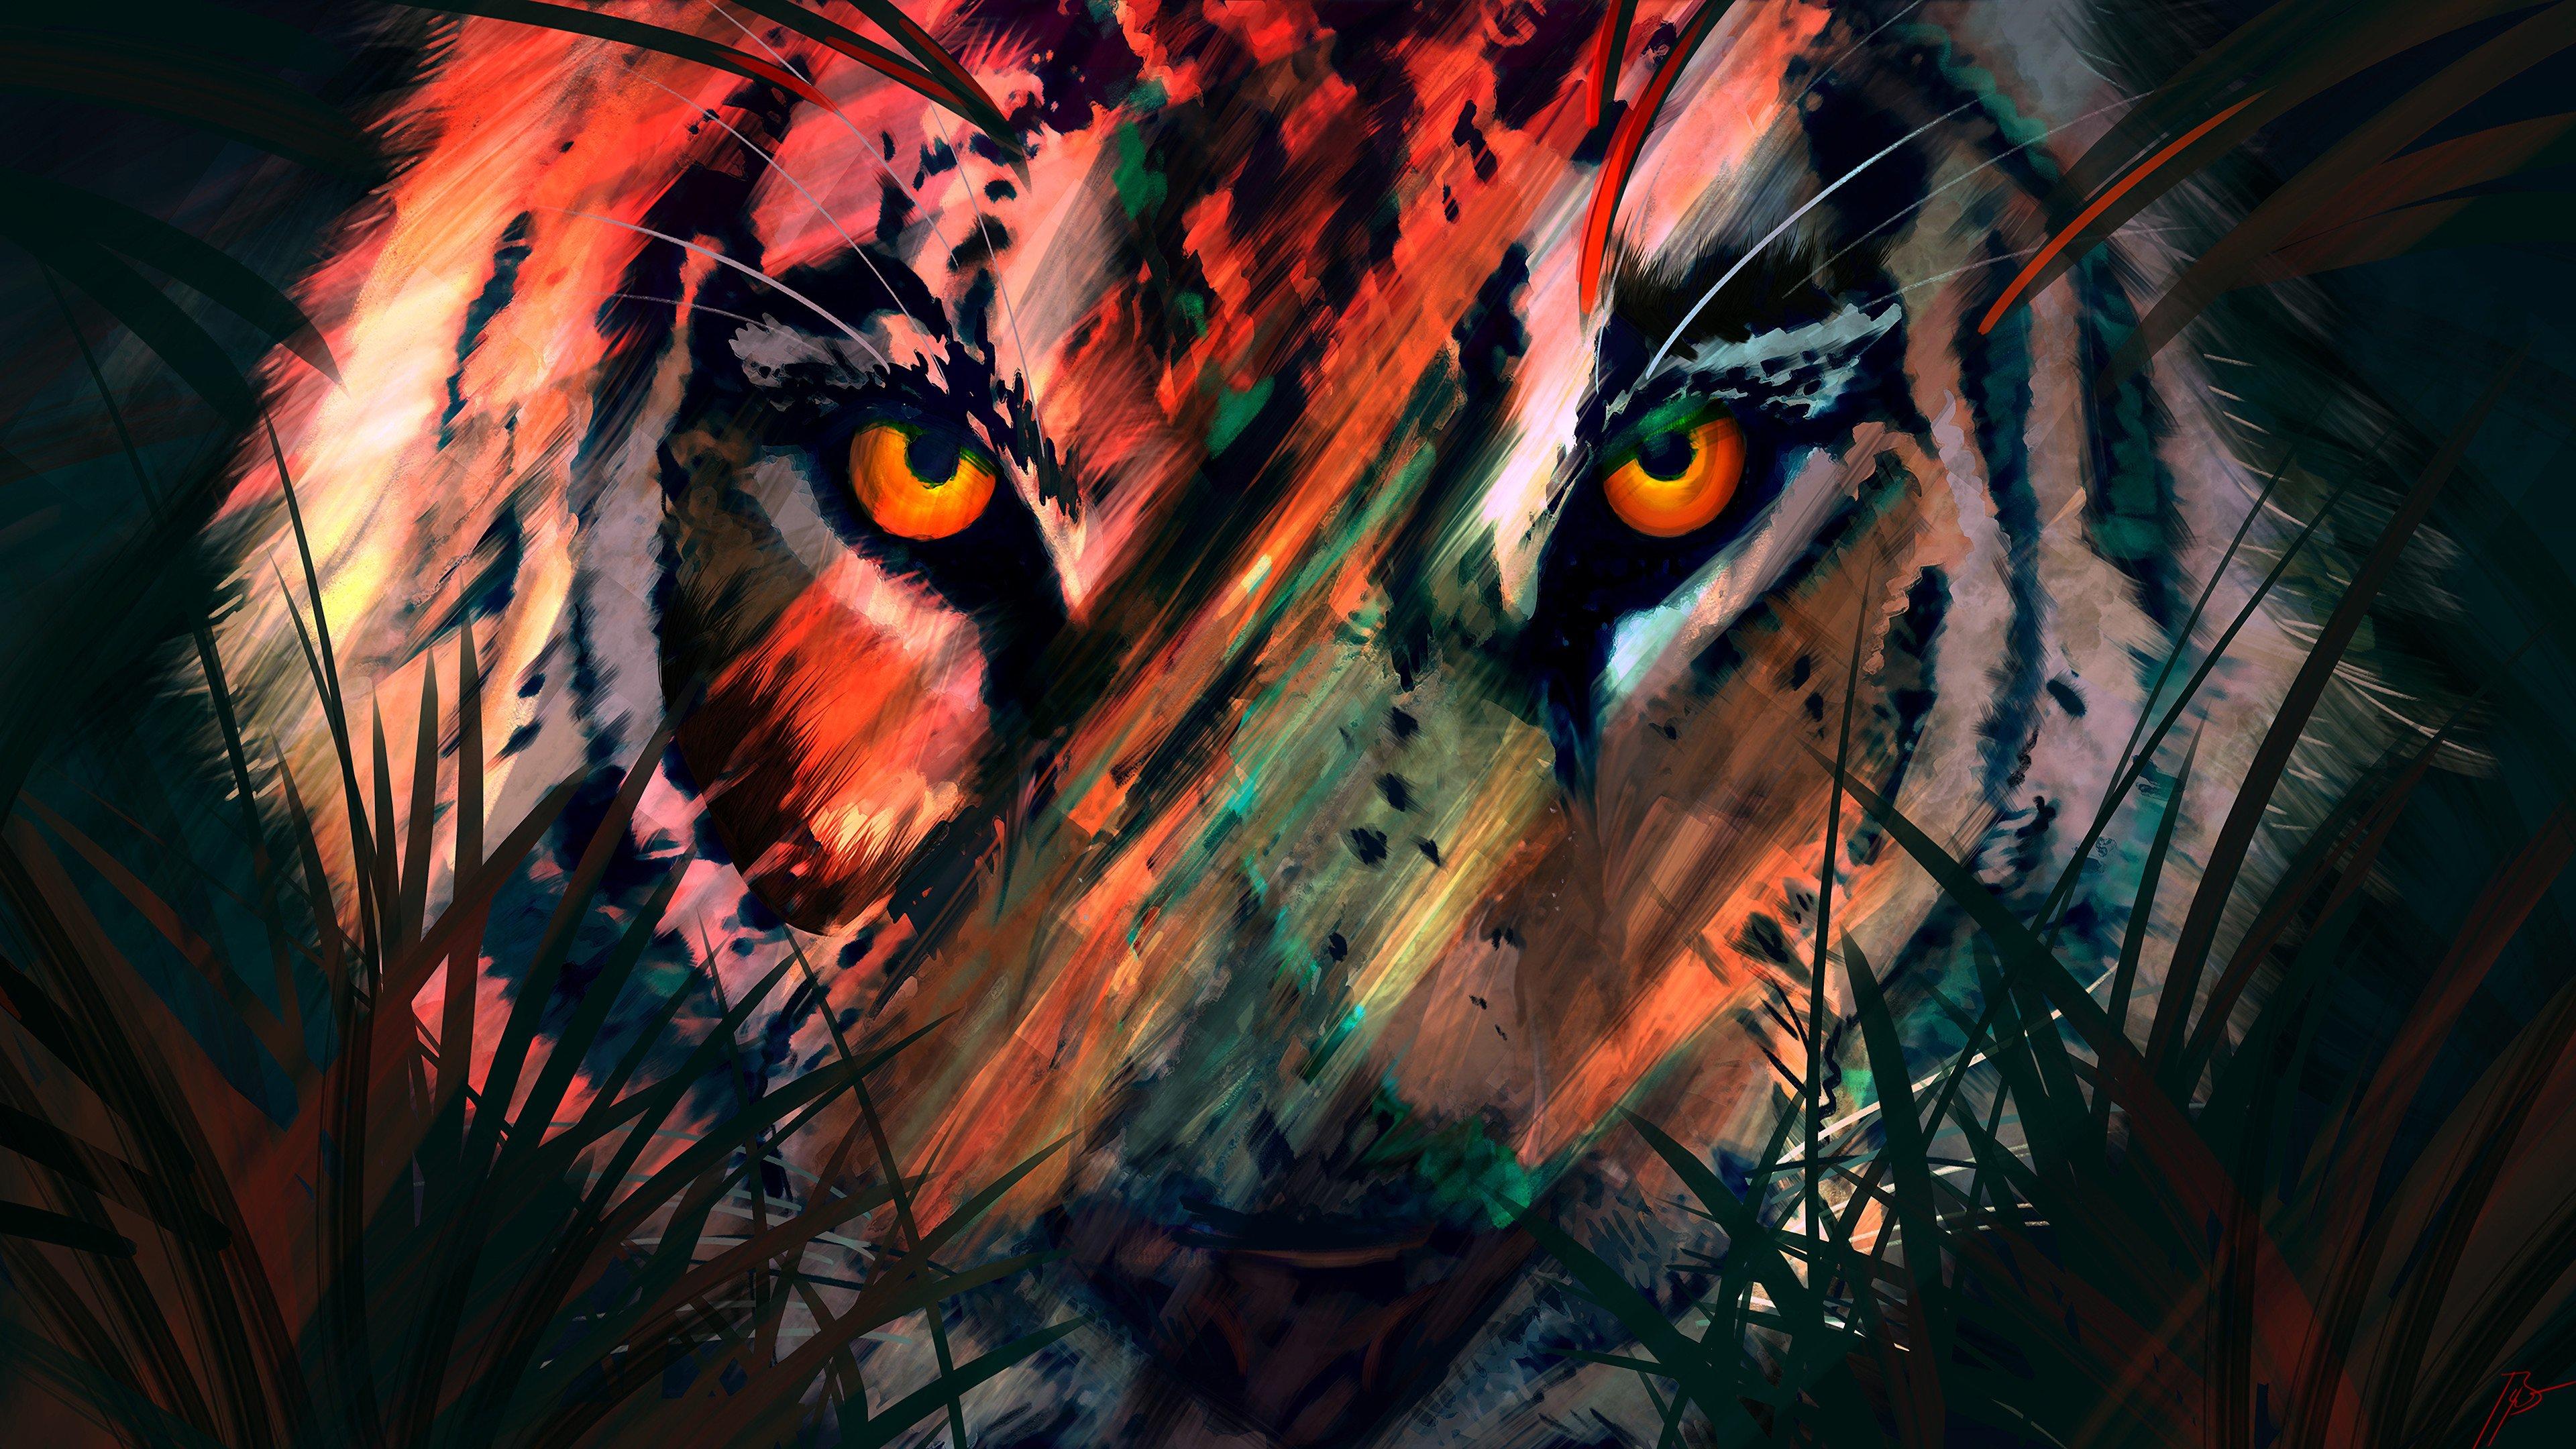 Fondos de pantalla Arte digital de tigre